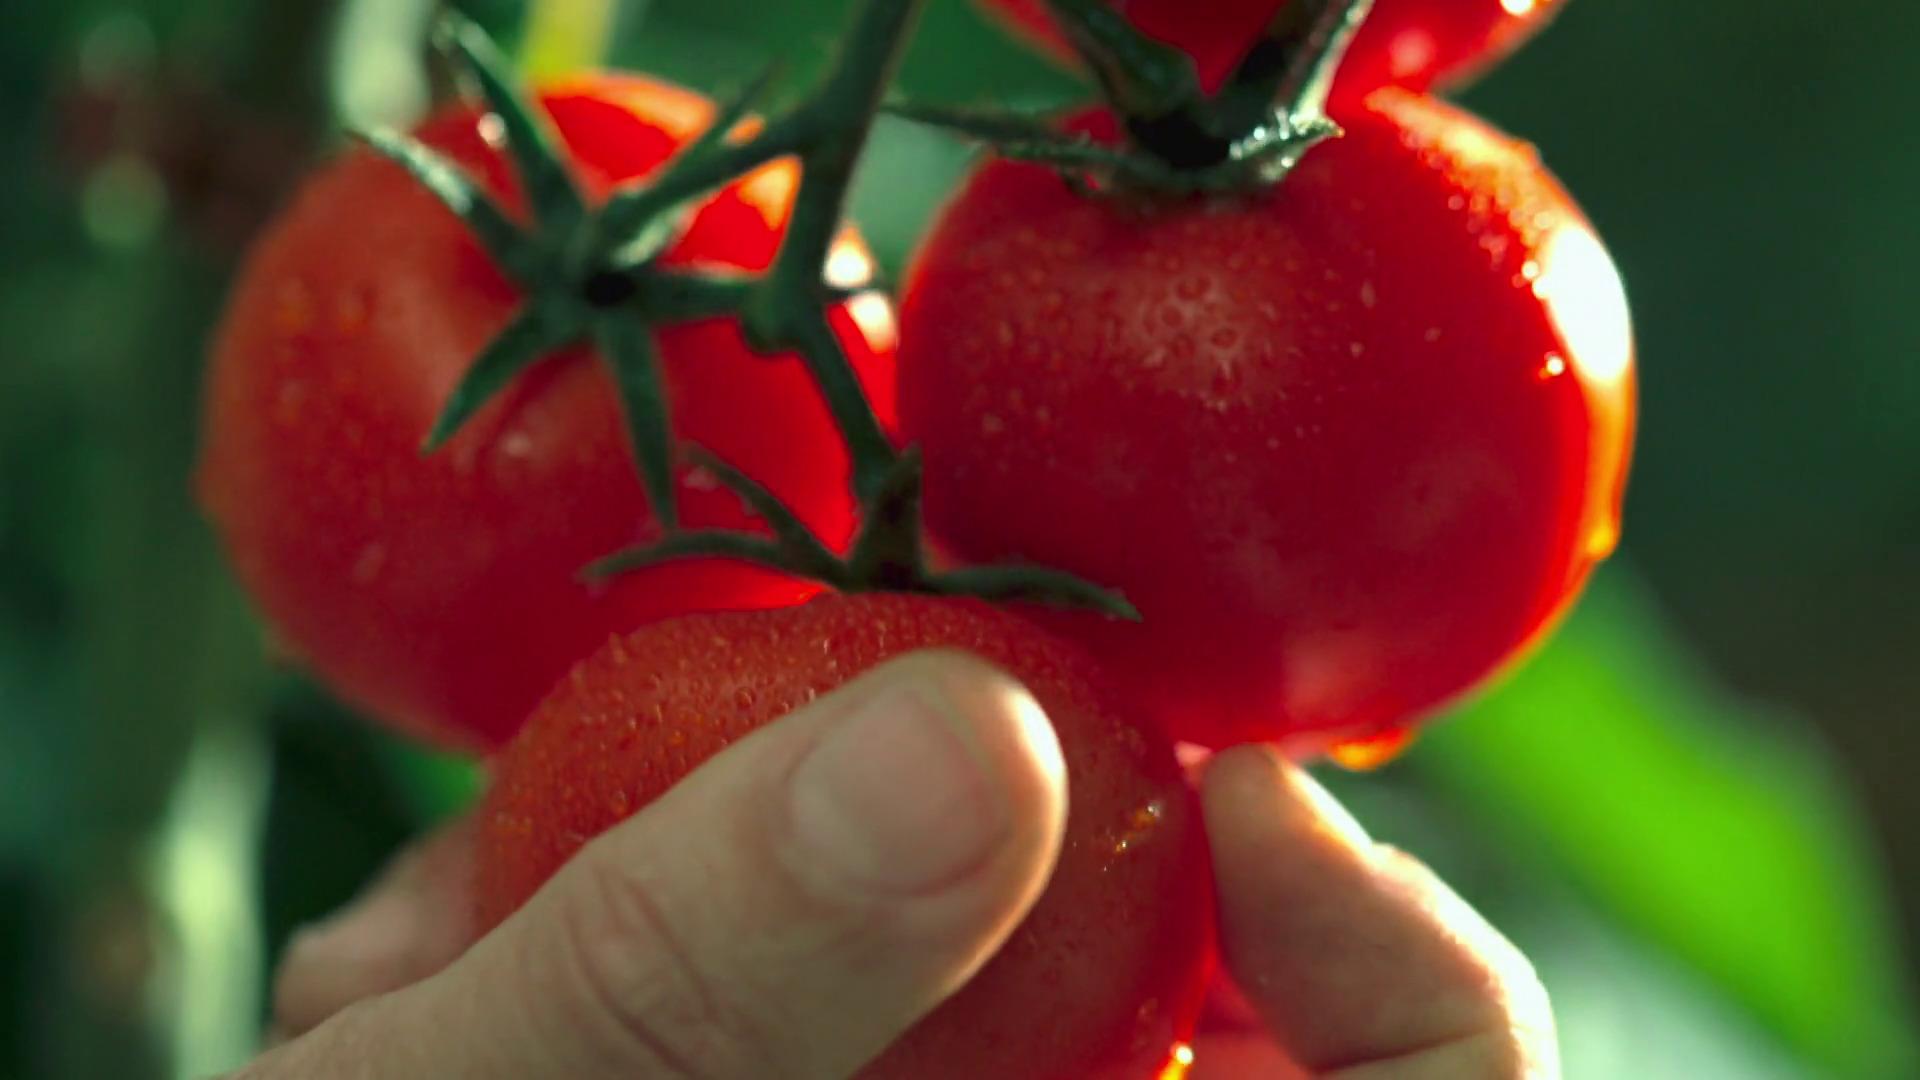 Temporada 1 Pan y tomate